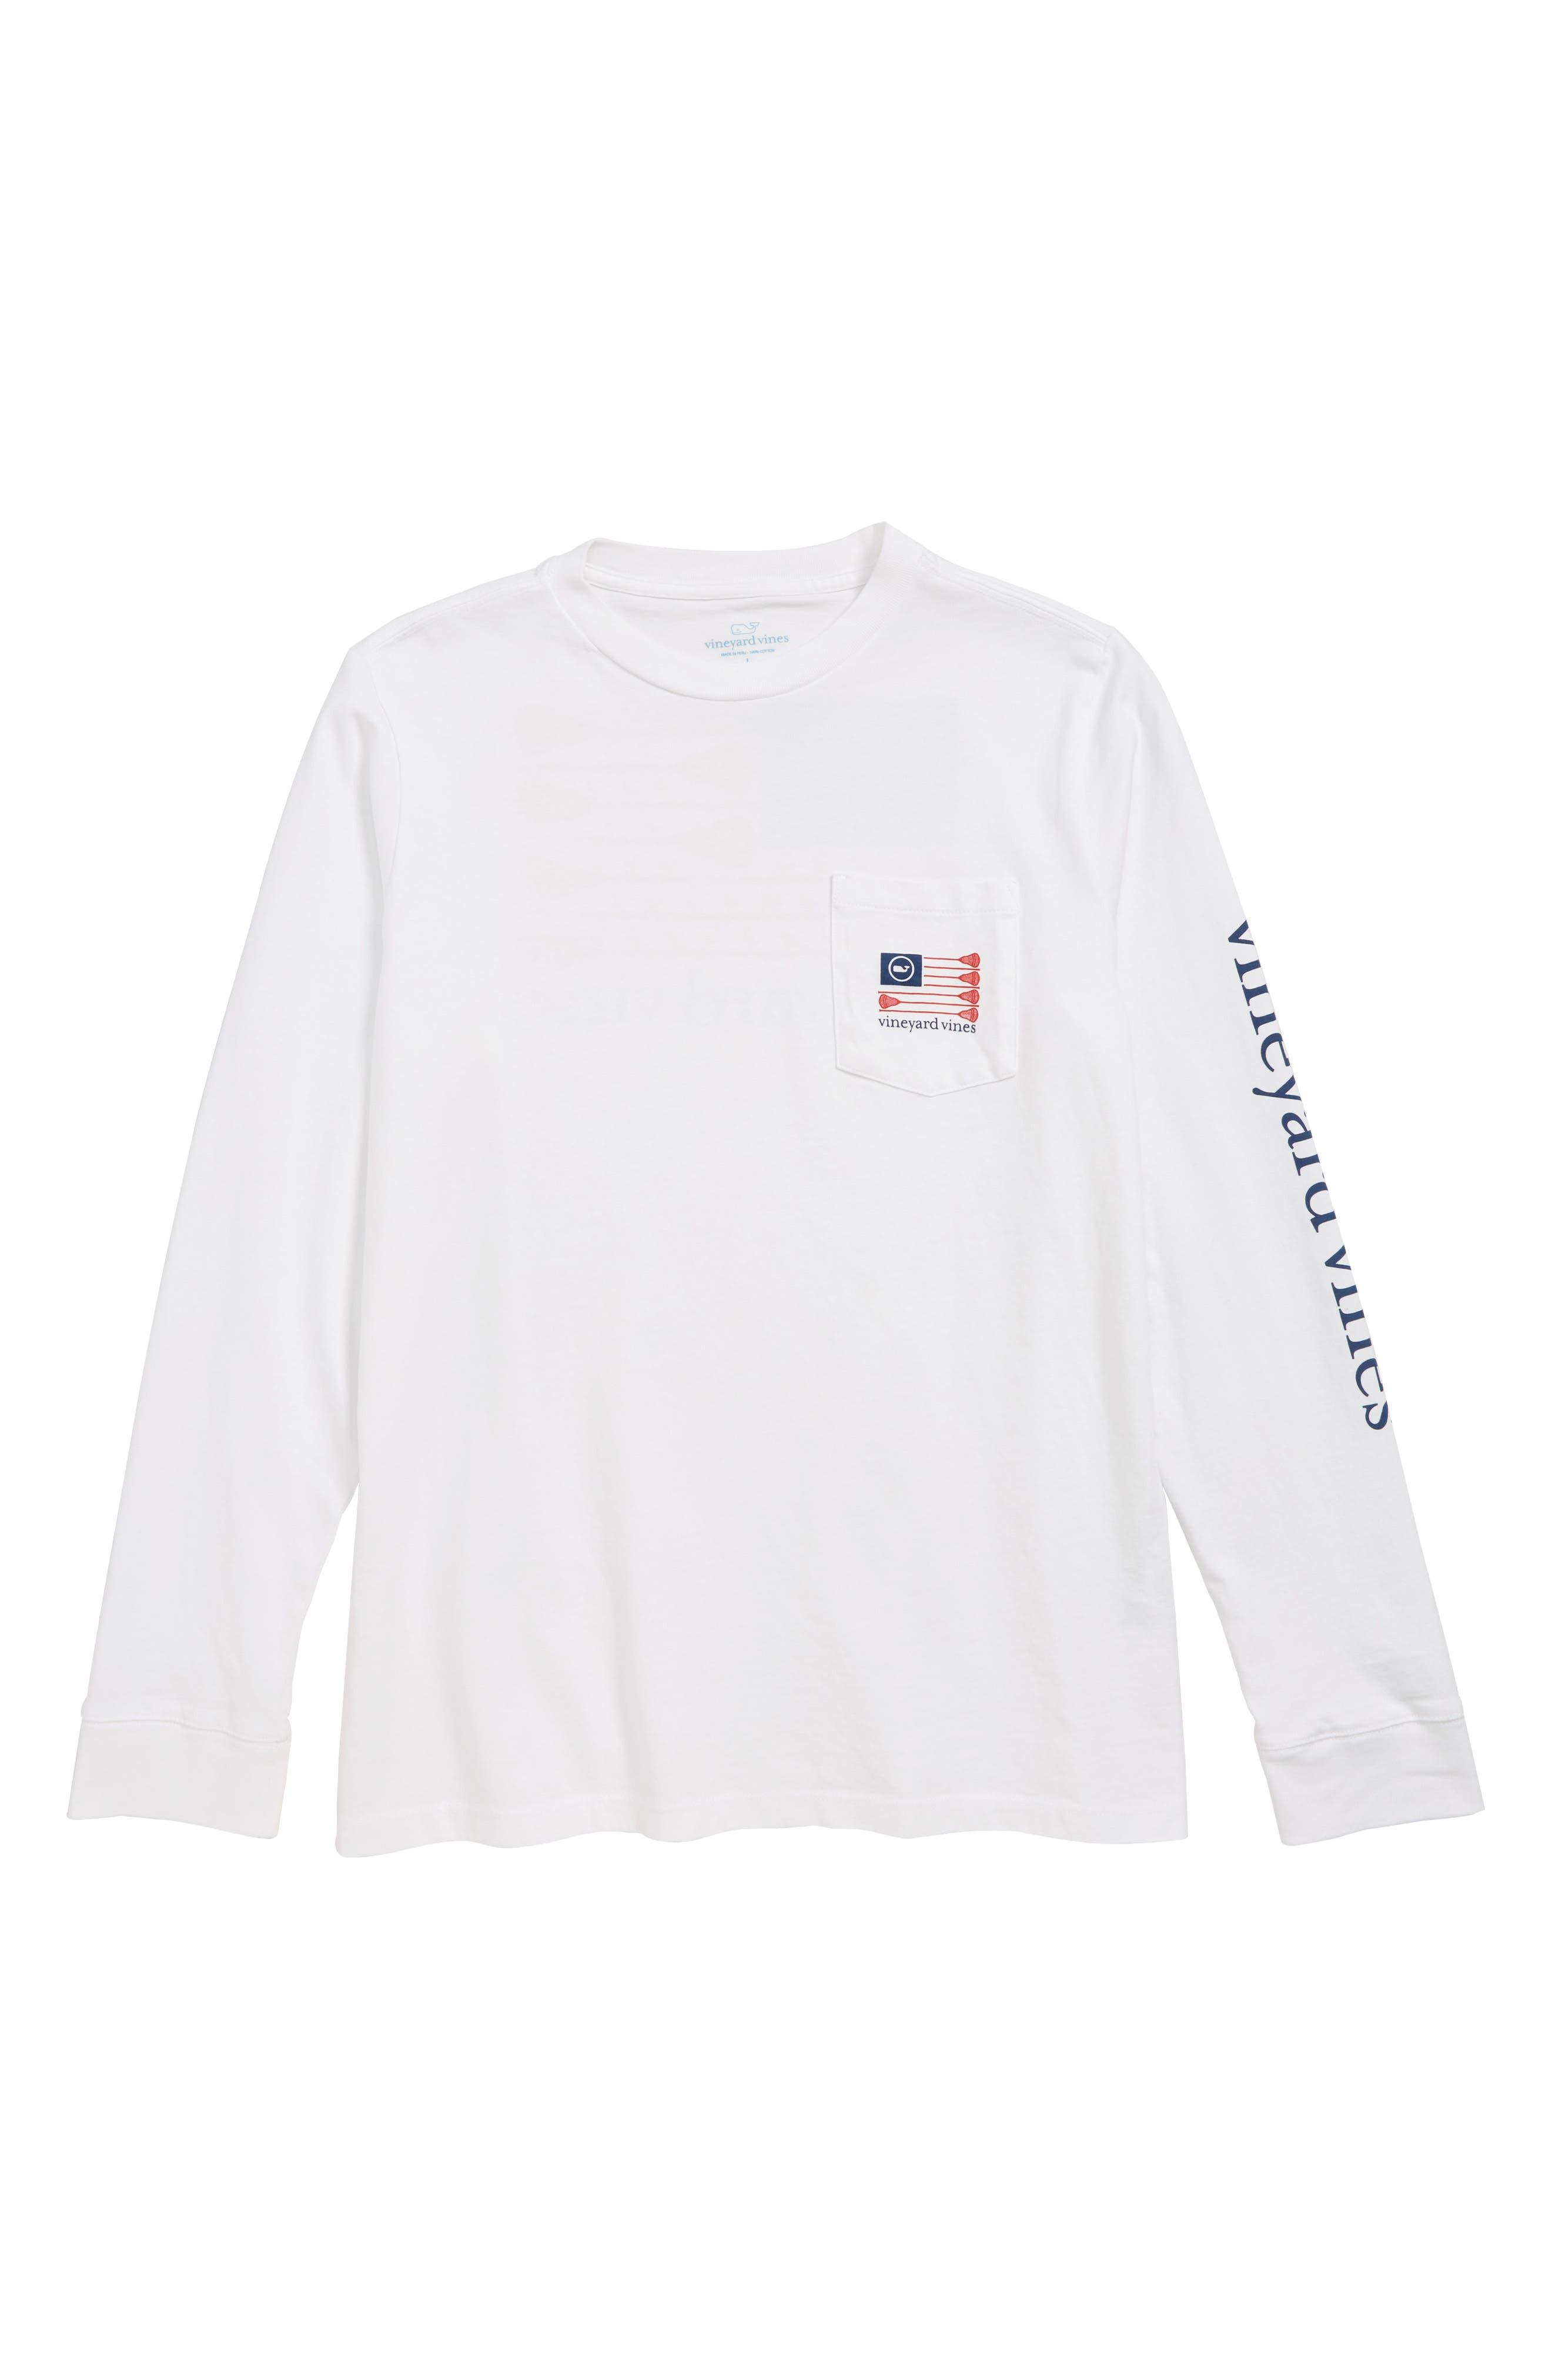 VINEYARD VINES, Lacrosse Flag Pocket T-Shirt, Main thumbnail 1, color, 100